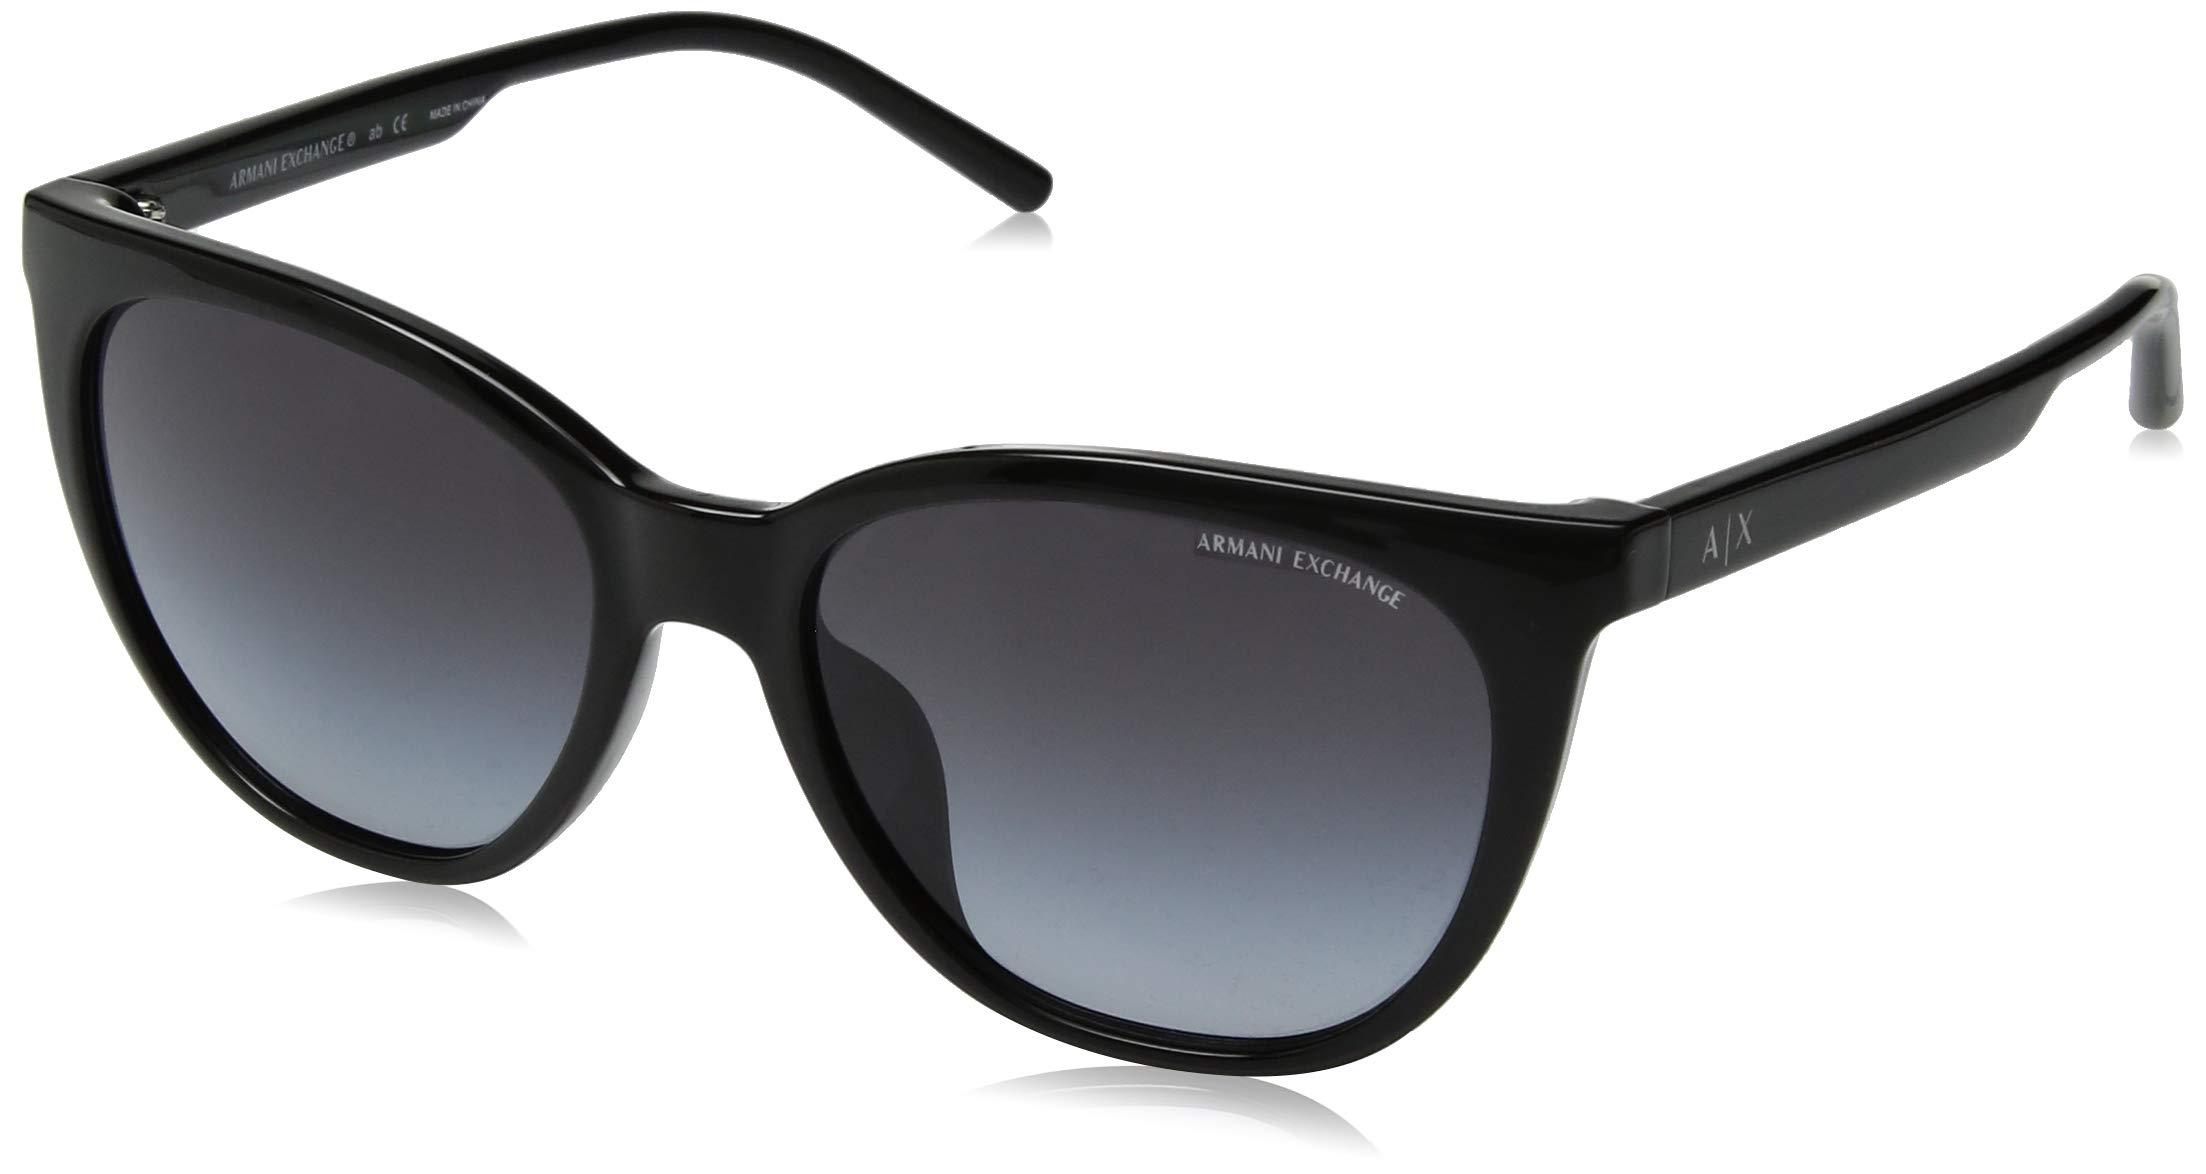 Armani Exchange Women's Plastic Woman Cateye Sunglasses, Black, 55 mm